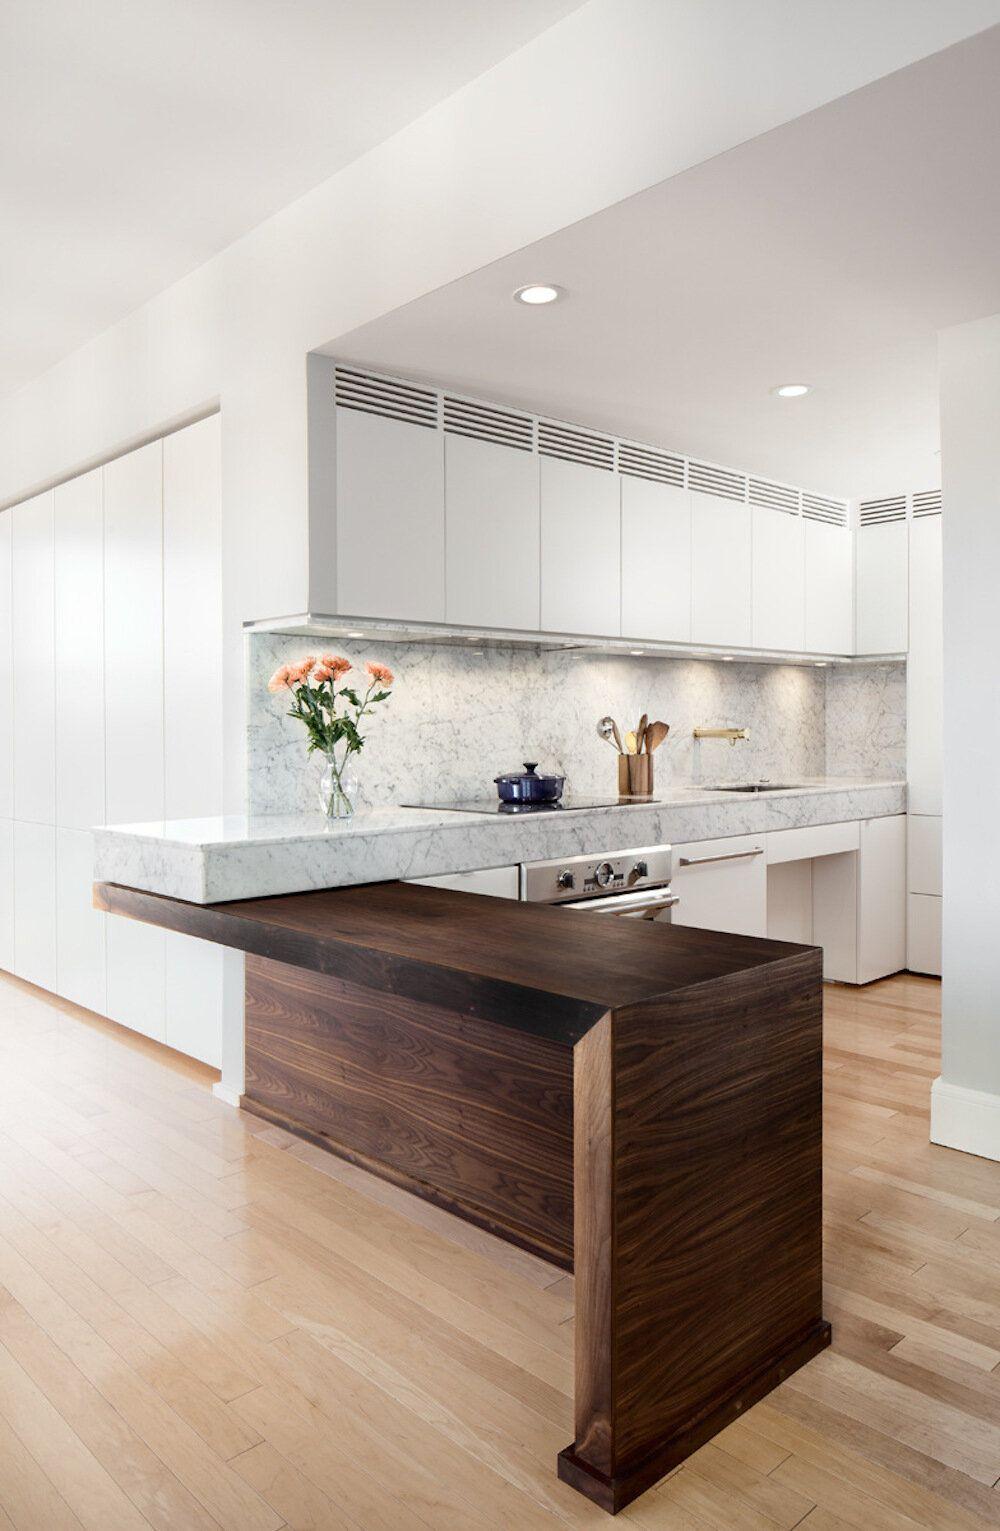 Inclusive Beautiful Designing Universal Spaces Scout Nimble Boston Interior Design Interior Design Kitchen Accessible Kitchen